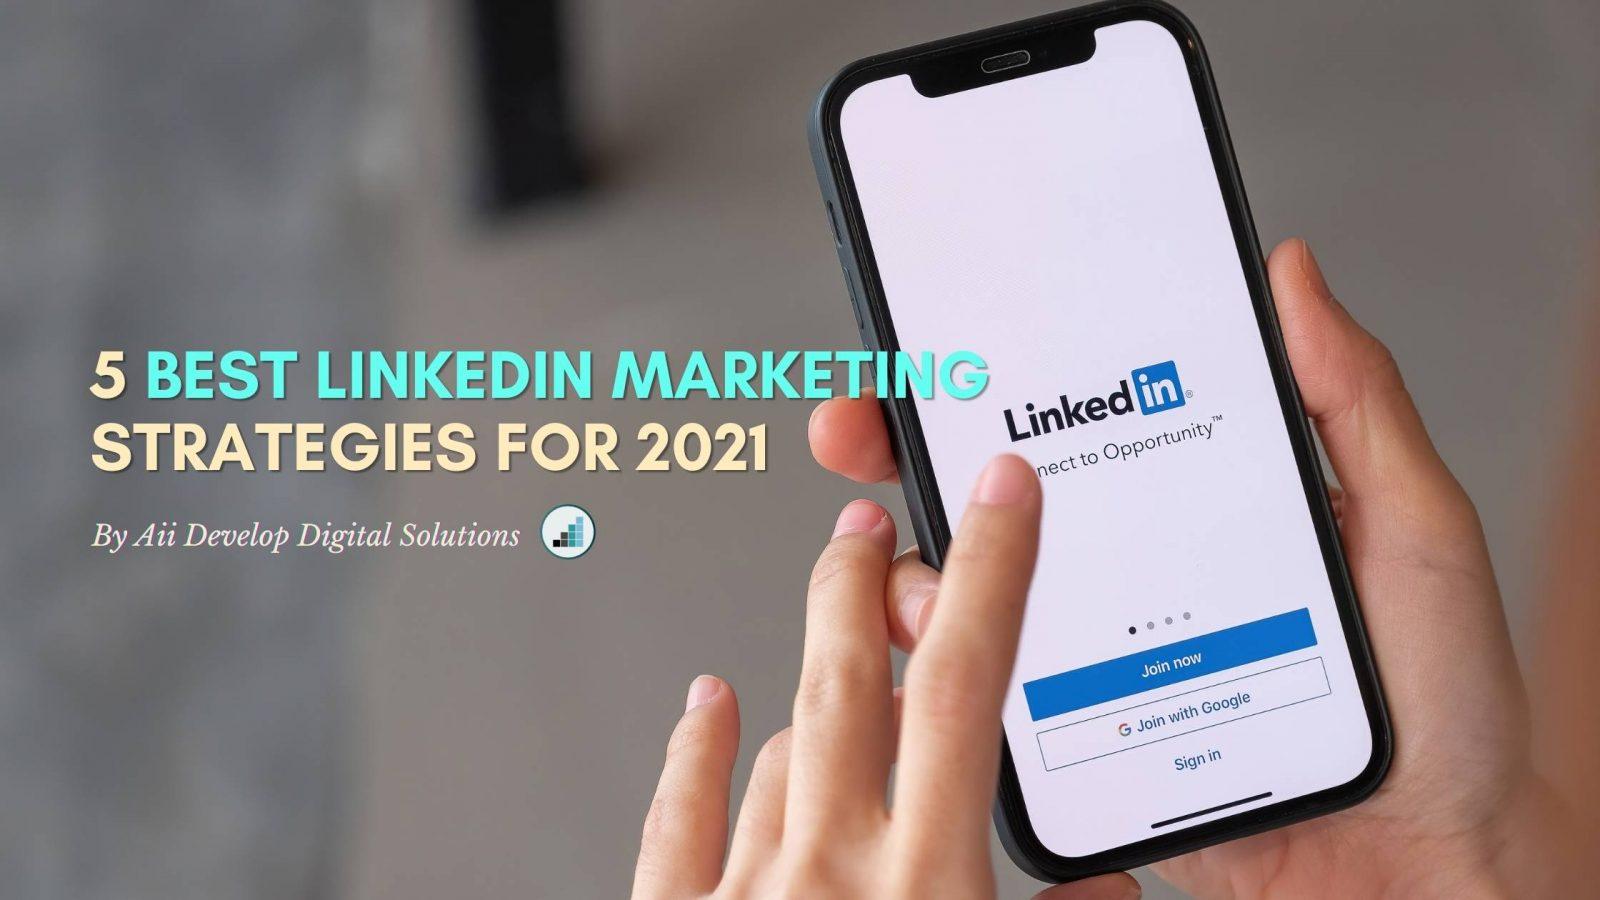 5 Best LinkedIn Marketing Strategies For 2021